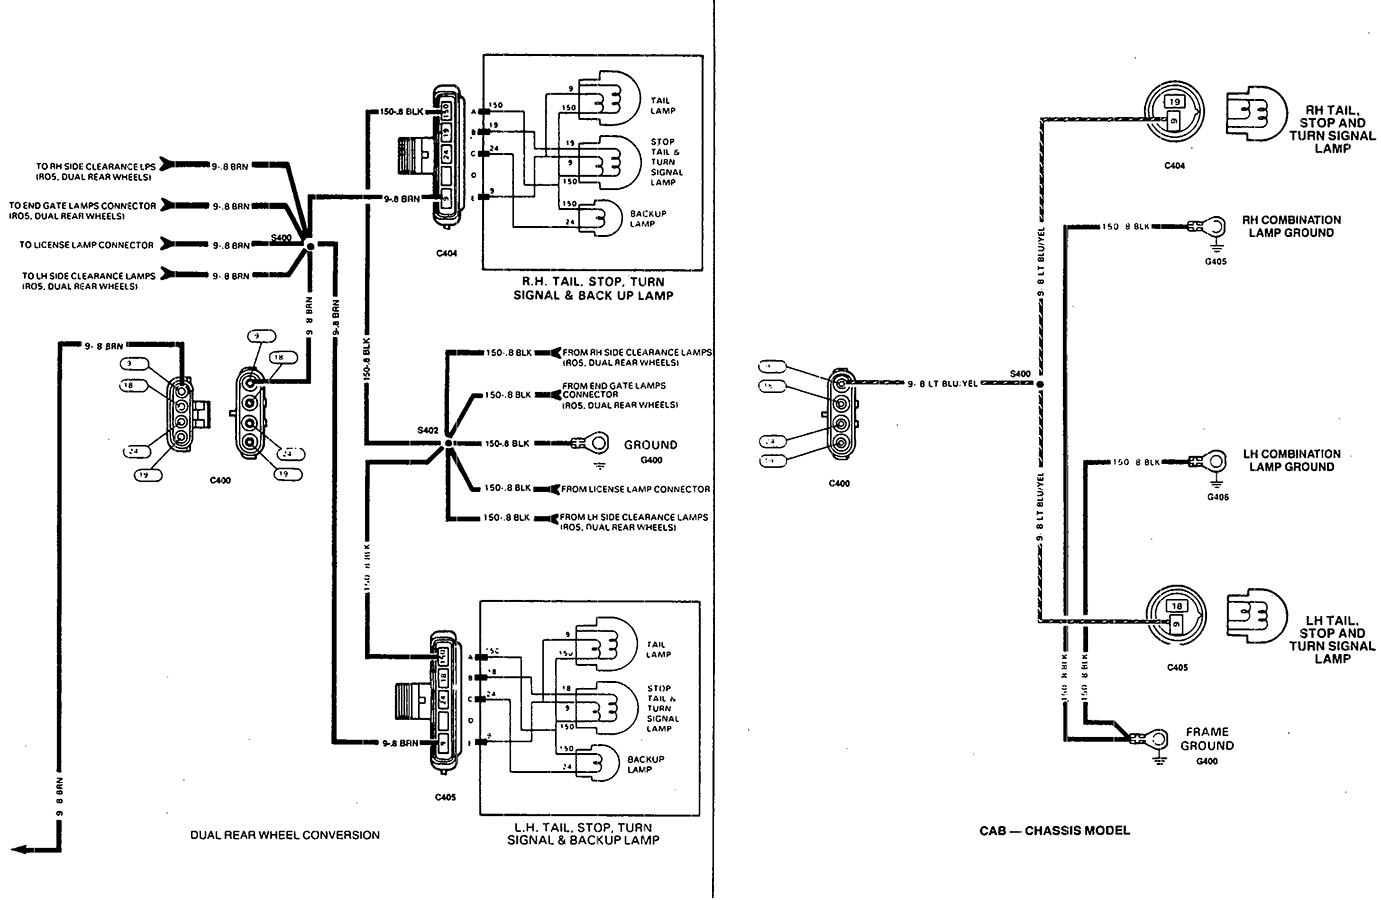 2006 gmc wiring diagram automotive wiring diagram library u2022 rh seigokanengland co uk